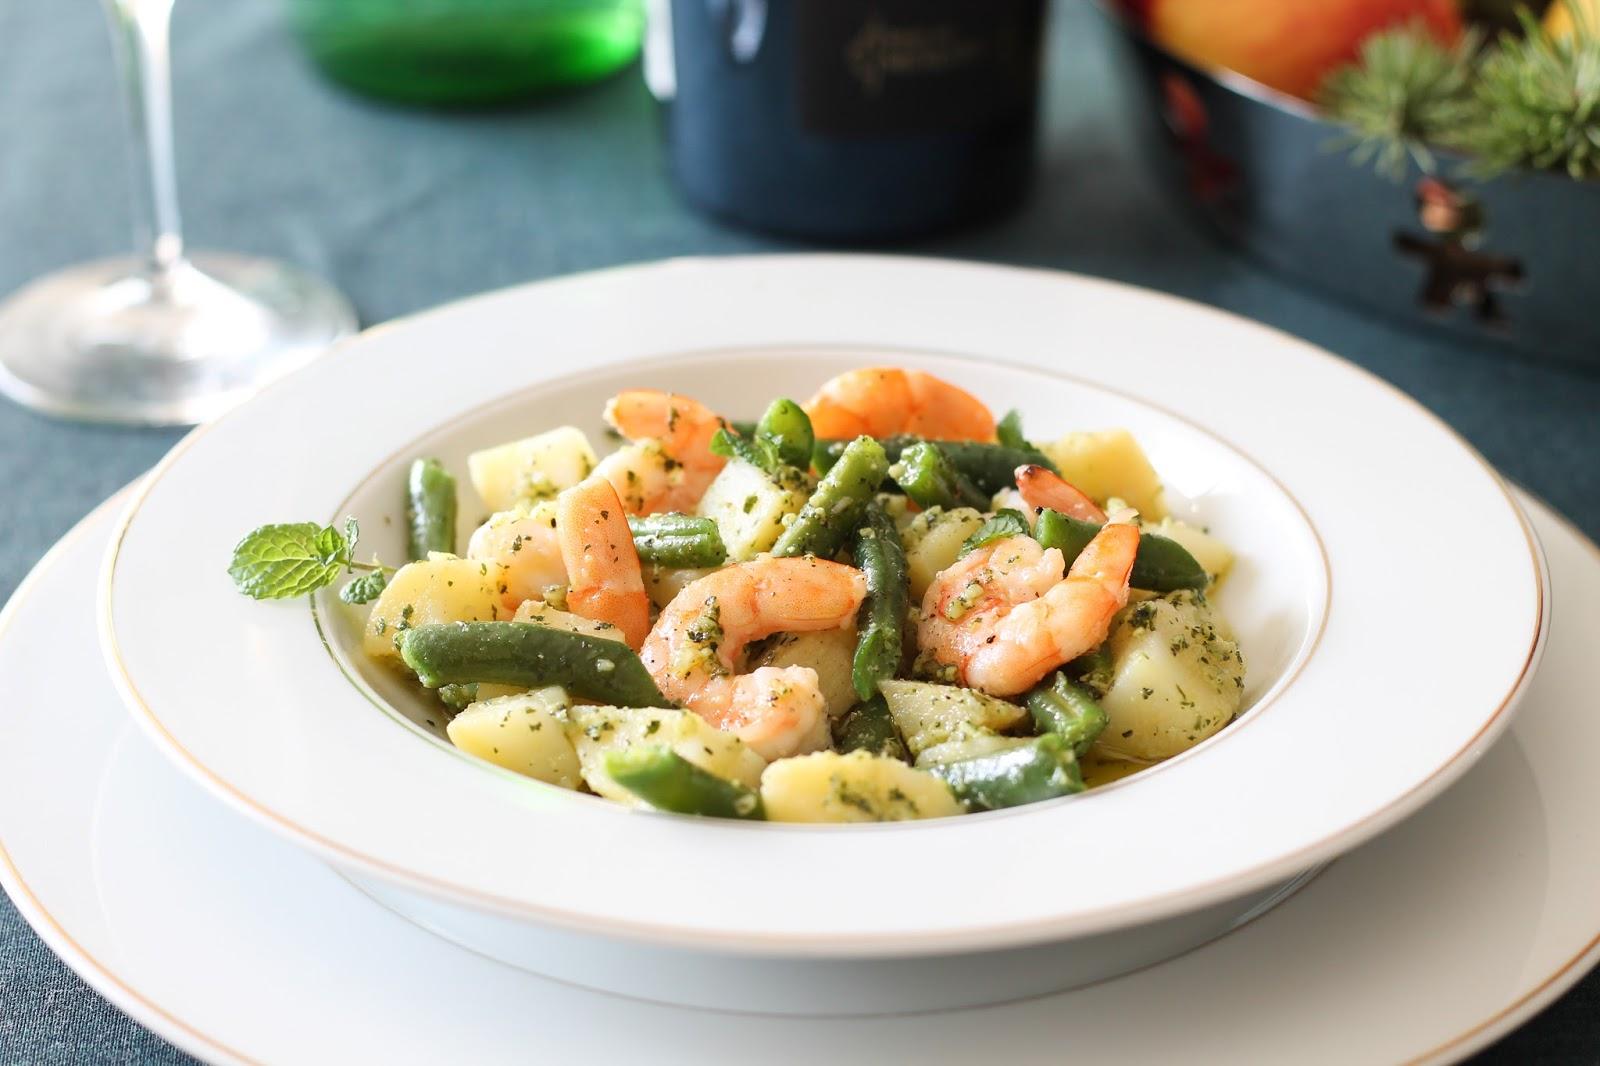 retsepty-salatov-foto-opisanie-ingredienty-3